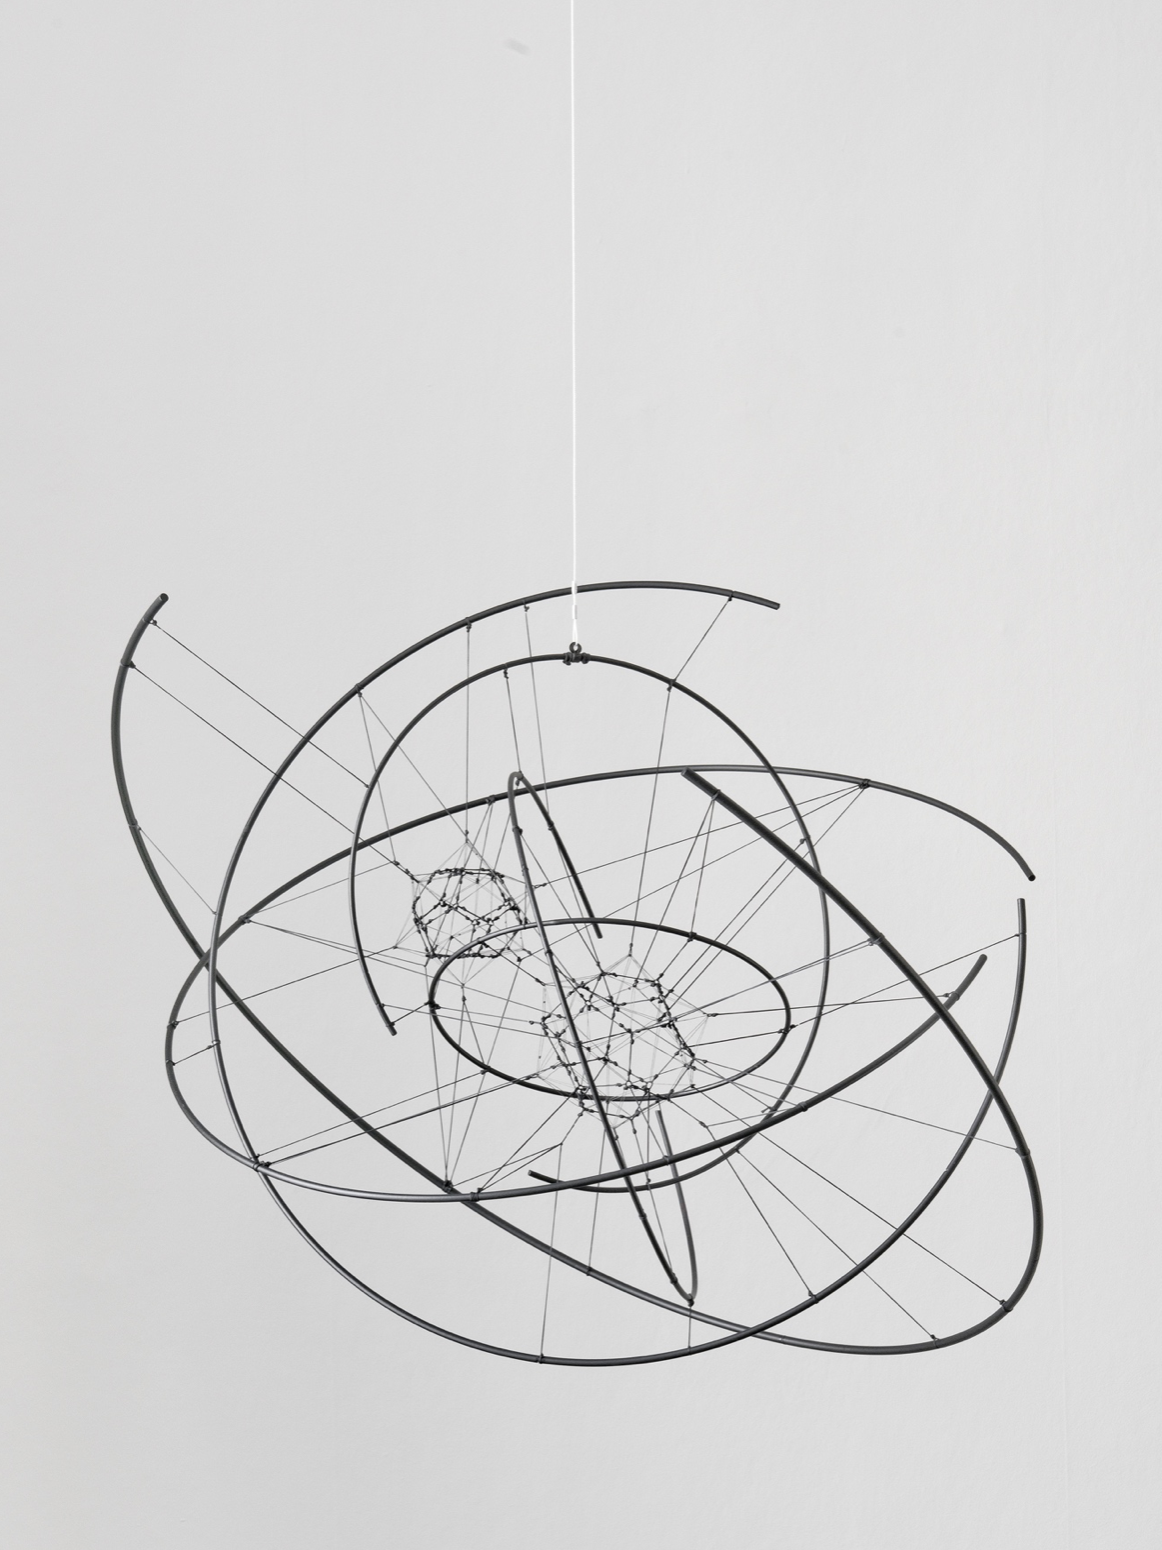 Tomás Saraceno  -  Zonal Harmonic 2N 60/6 , 2017, Carbon fibre, rope, glue